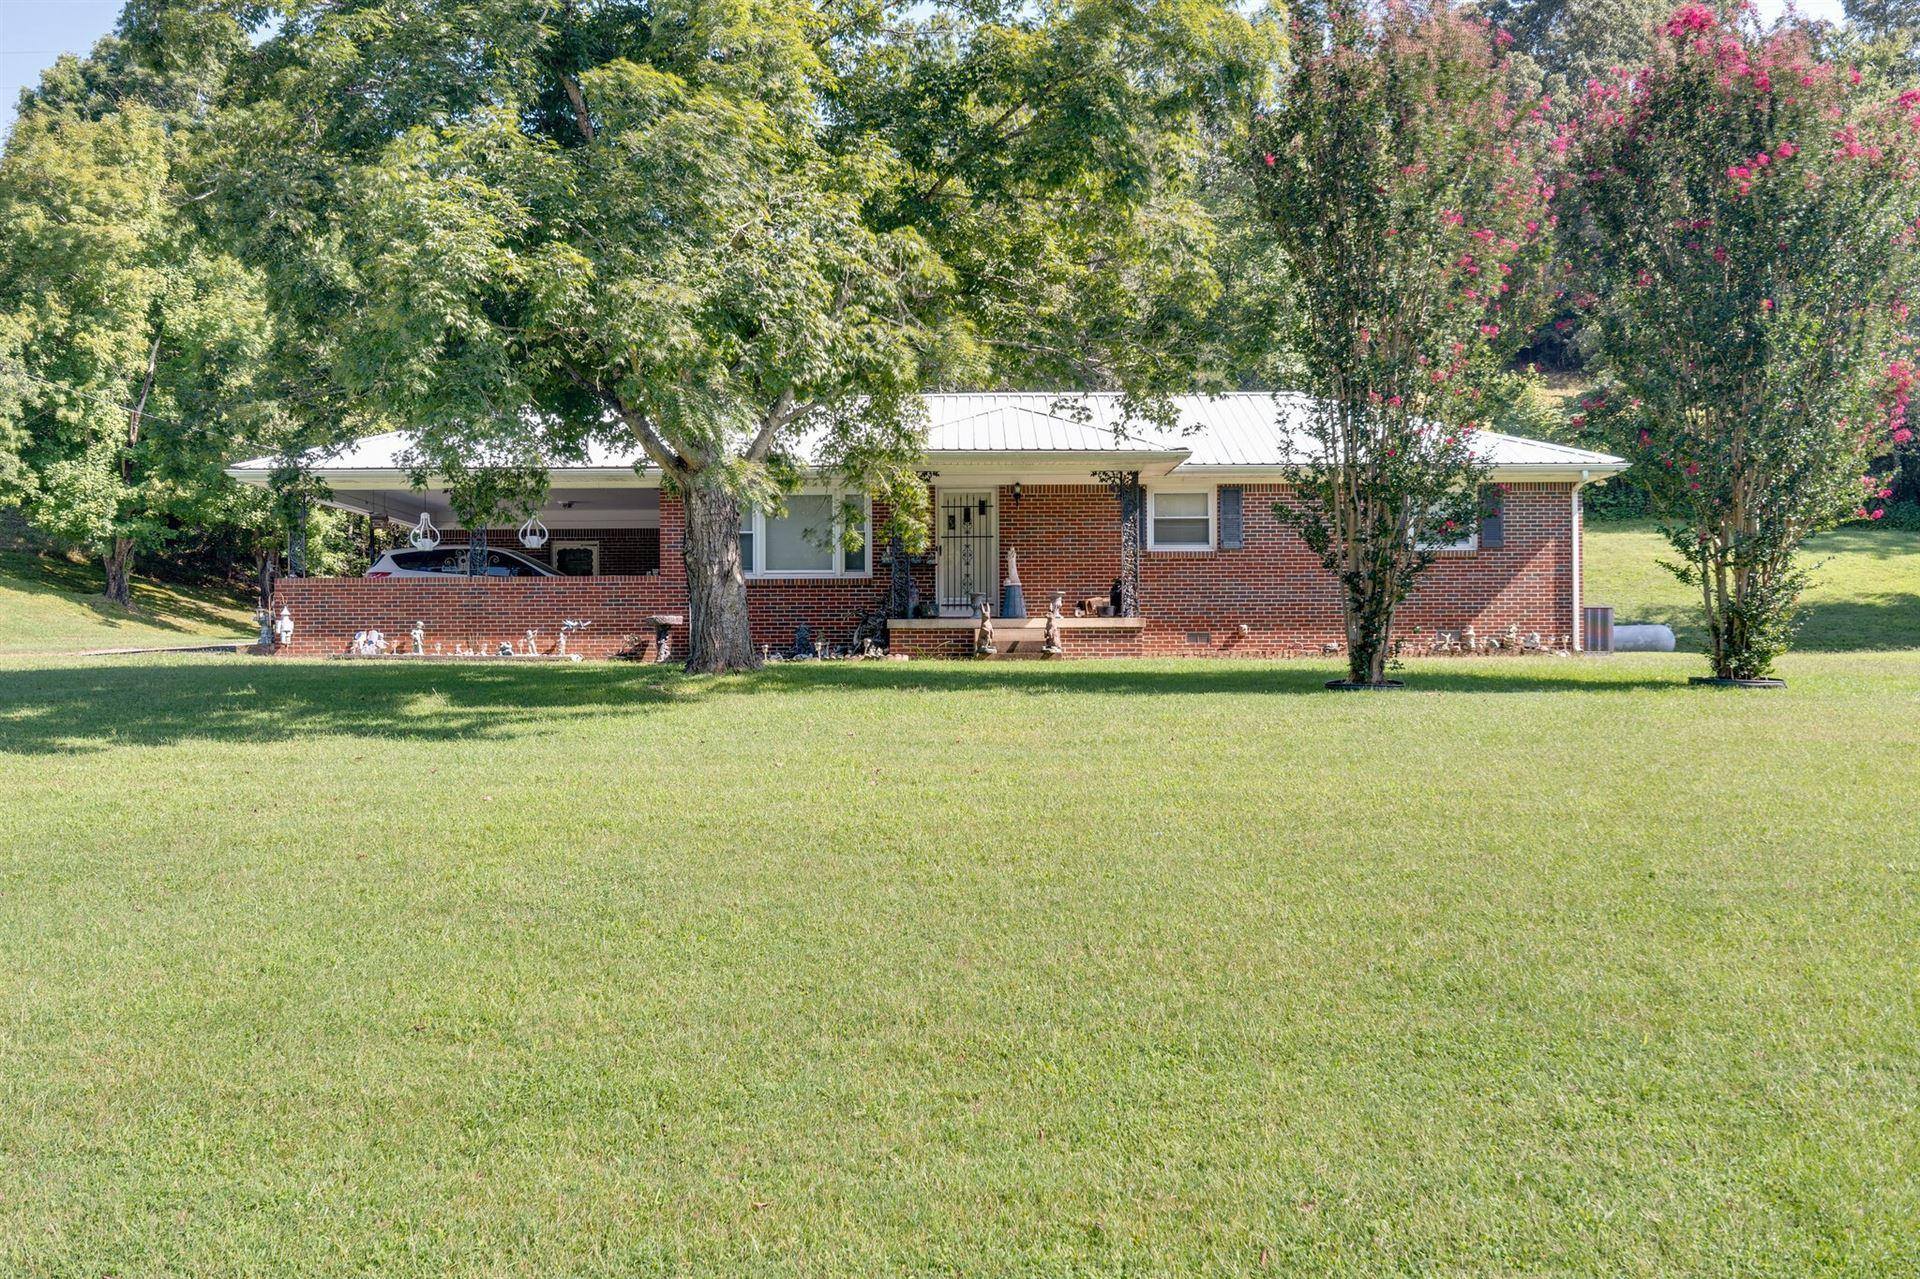 1425 Highway 50 E, Centerville, TN 37033 - MLS#: 2293755